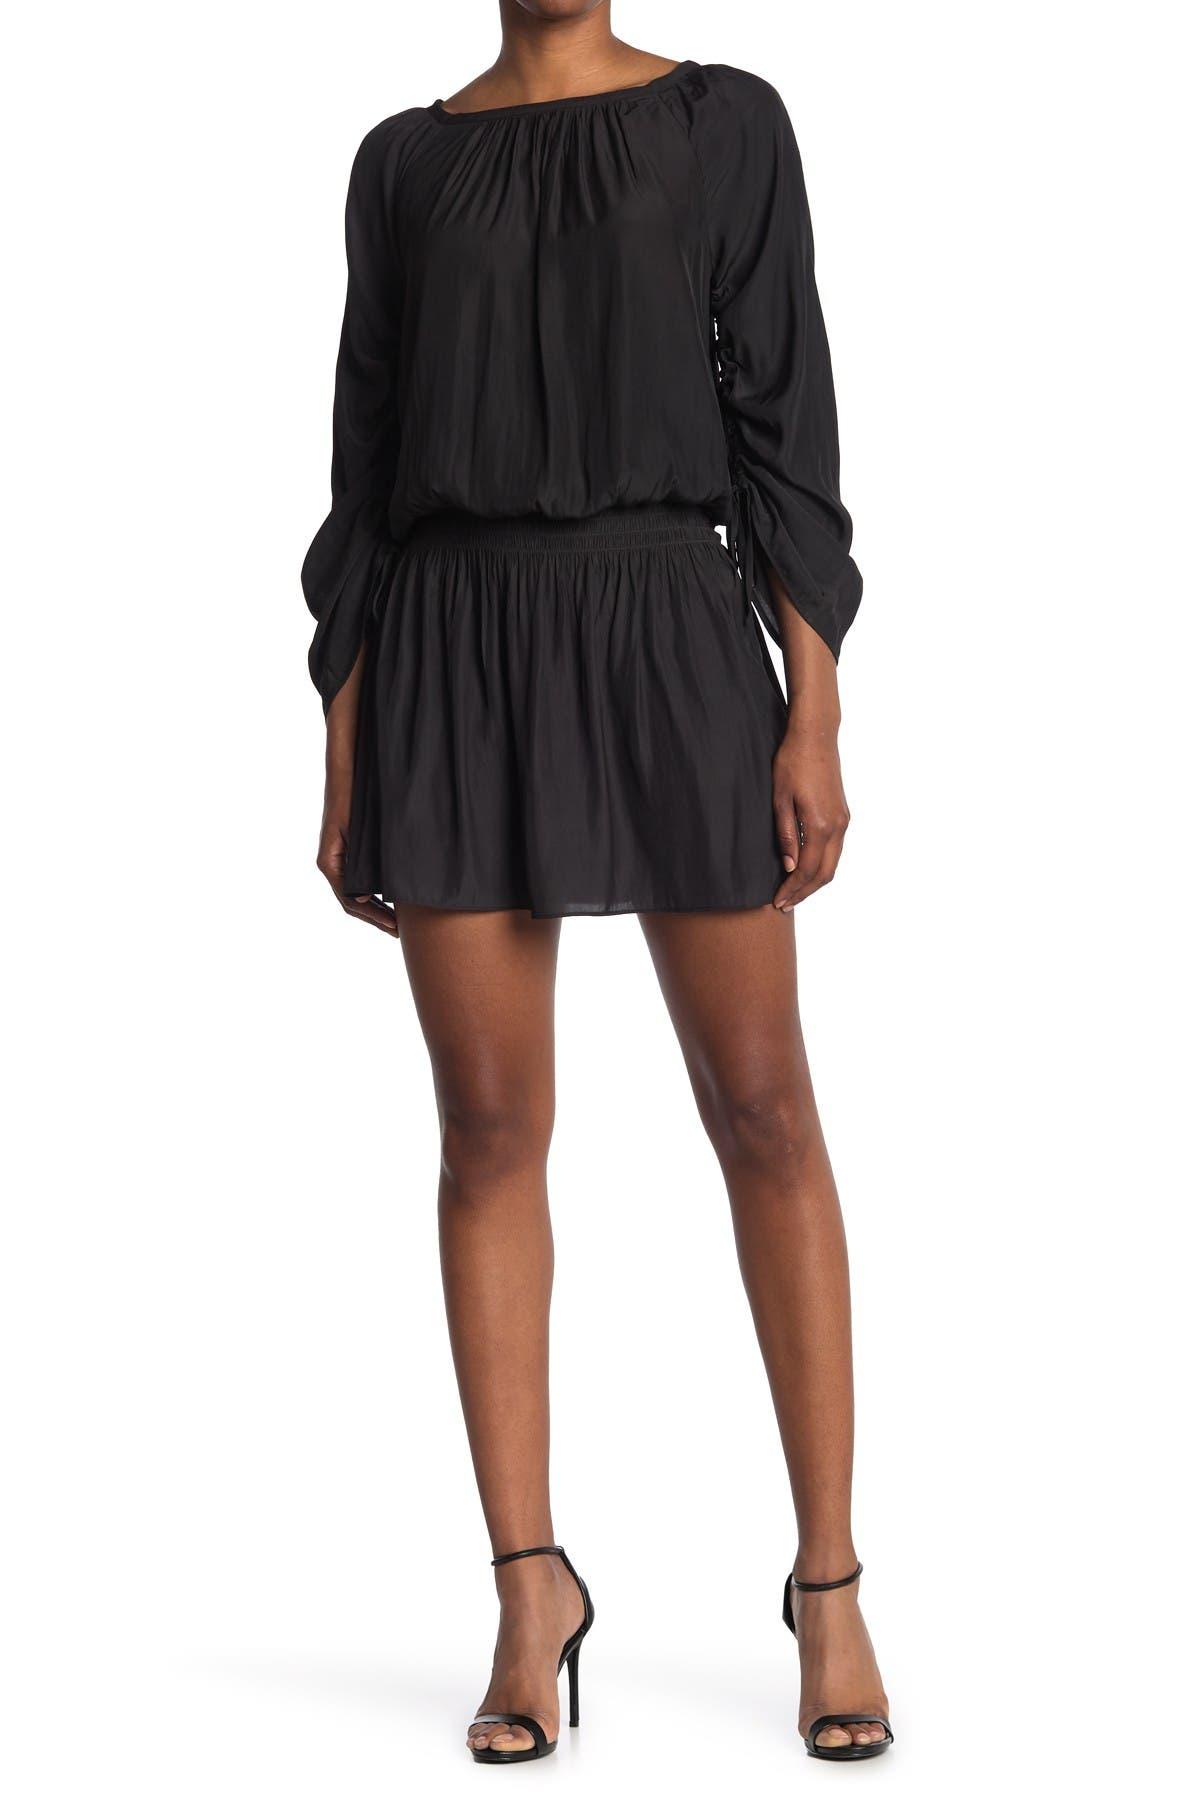 Image of Ramy Brook Jo Smocked Cinch Quarter Sleeve Dress